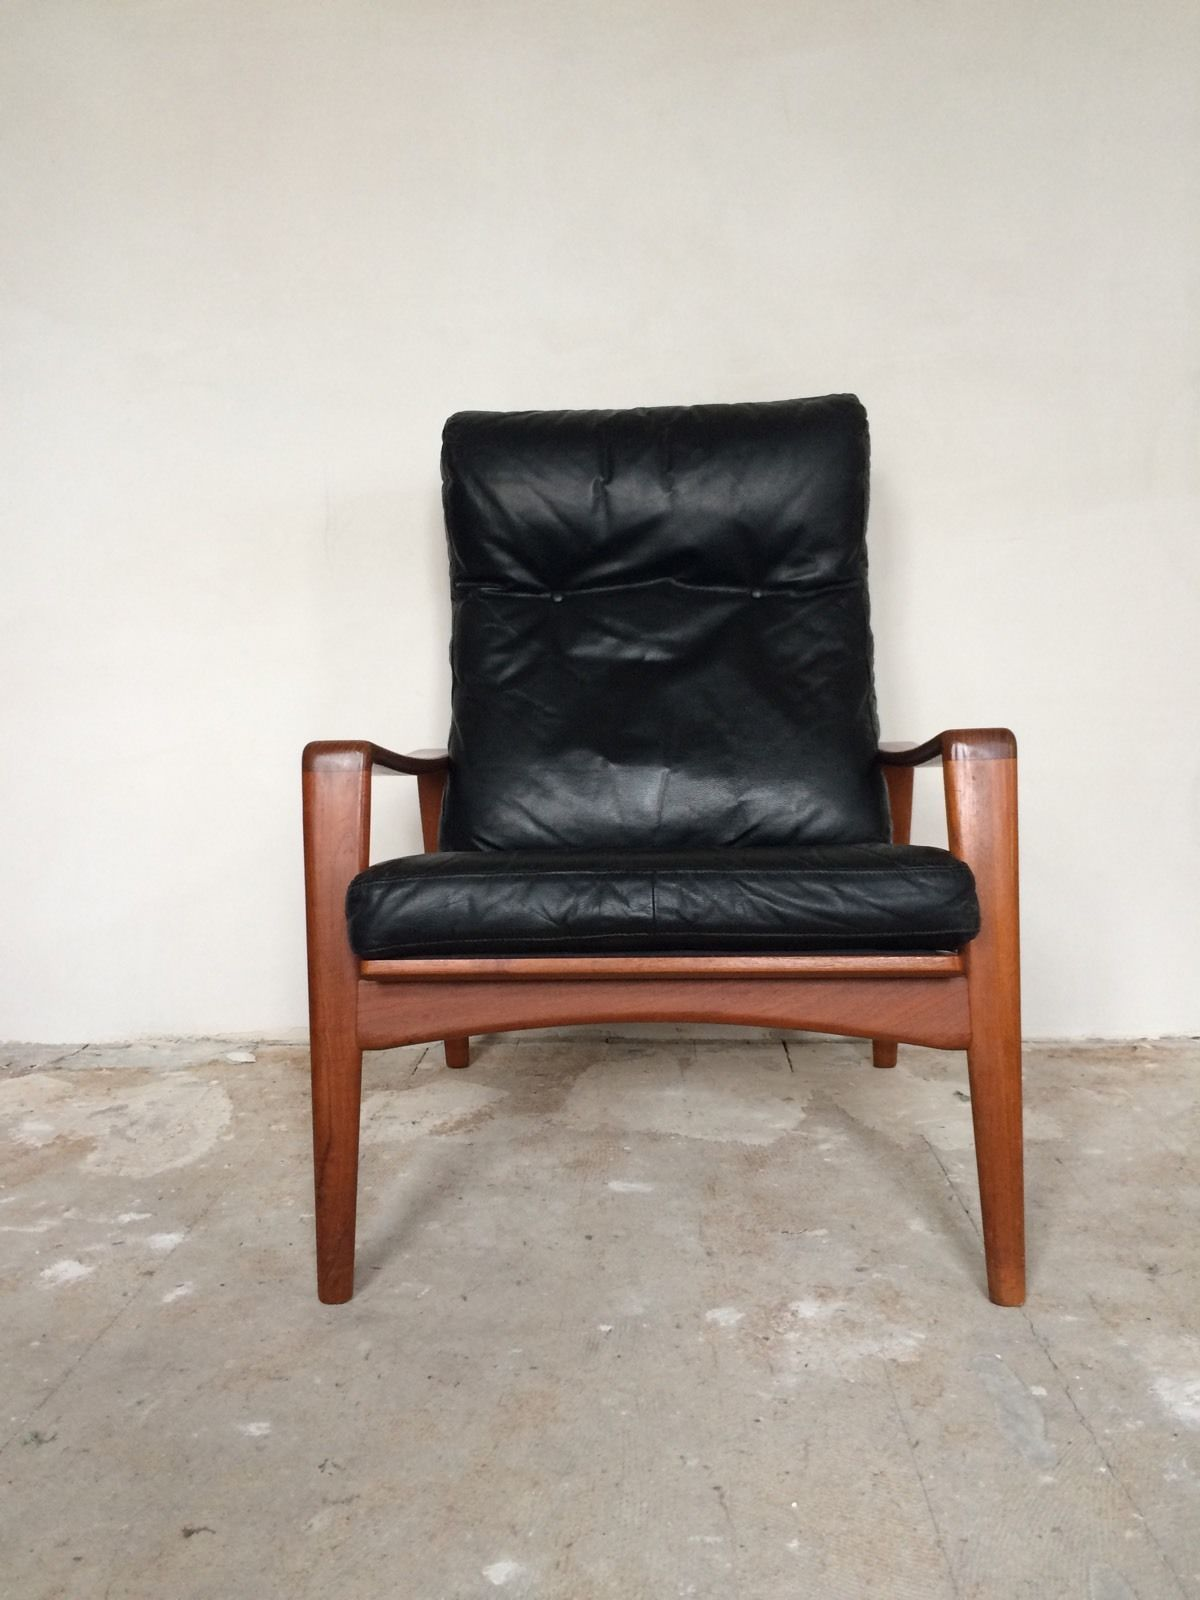 Arne wahl iversen komfort lounge chair teak 60s danish for Sessel 60er design